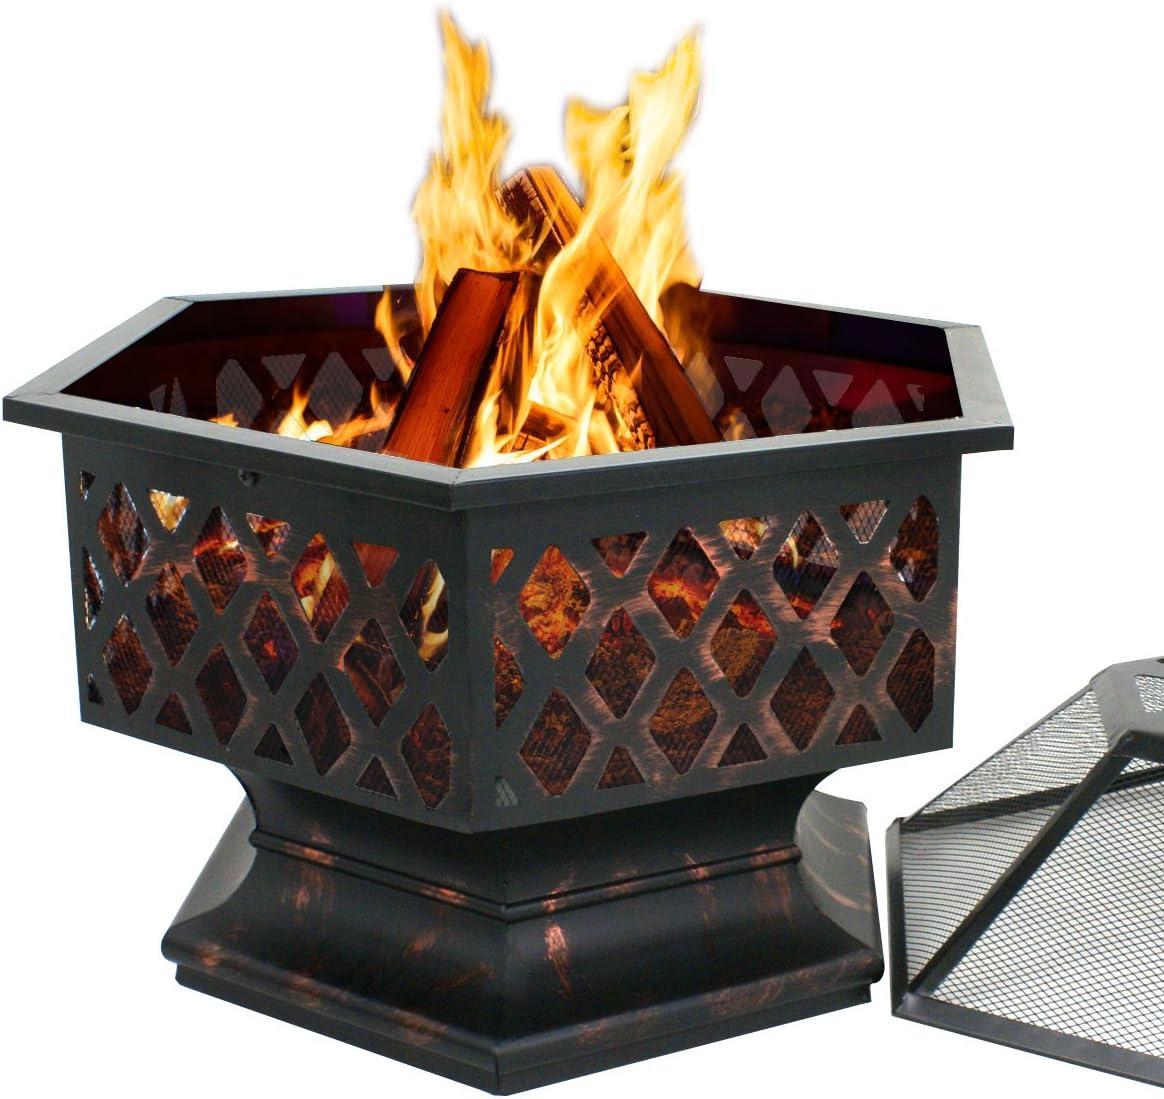 ZenStyle Hex Shaped 24 Fire Pit Outdoor Oil-Rubbed Bronze Heavy Steel Firepit Hexagon Wood Burning Fireplace for Patio, Backyard, Garden, Outdoor